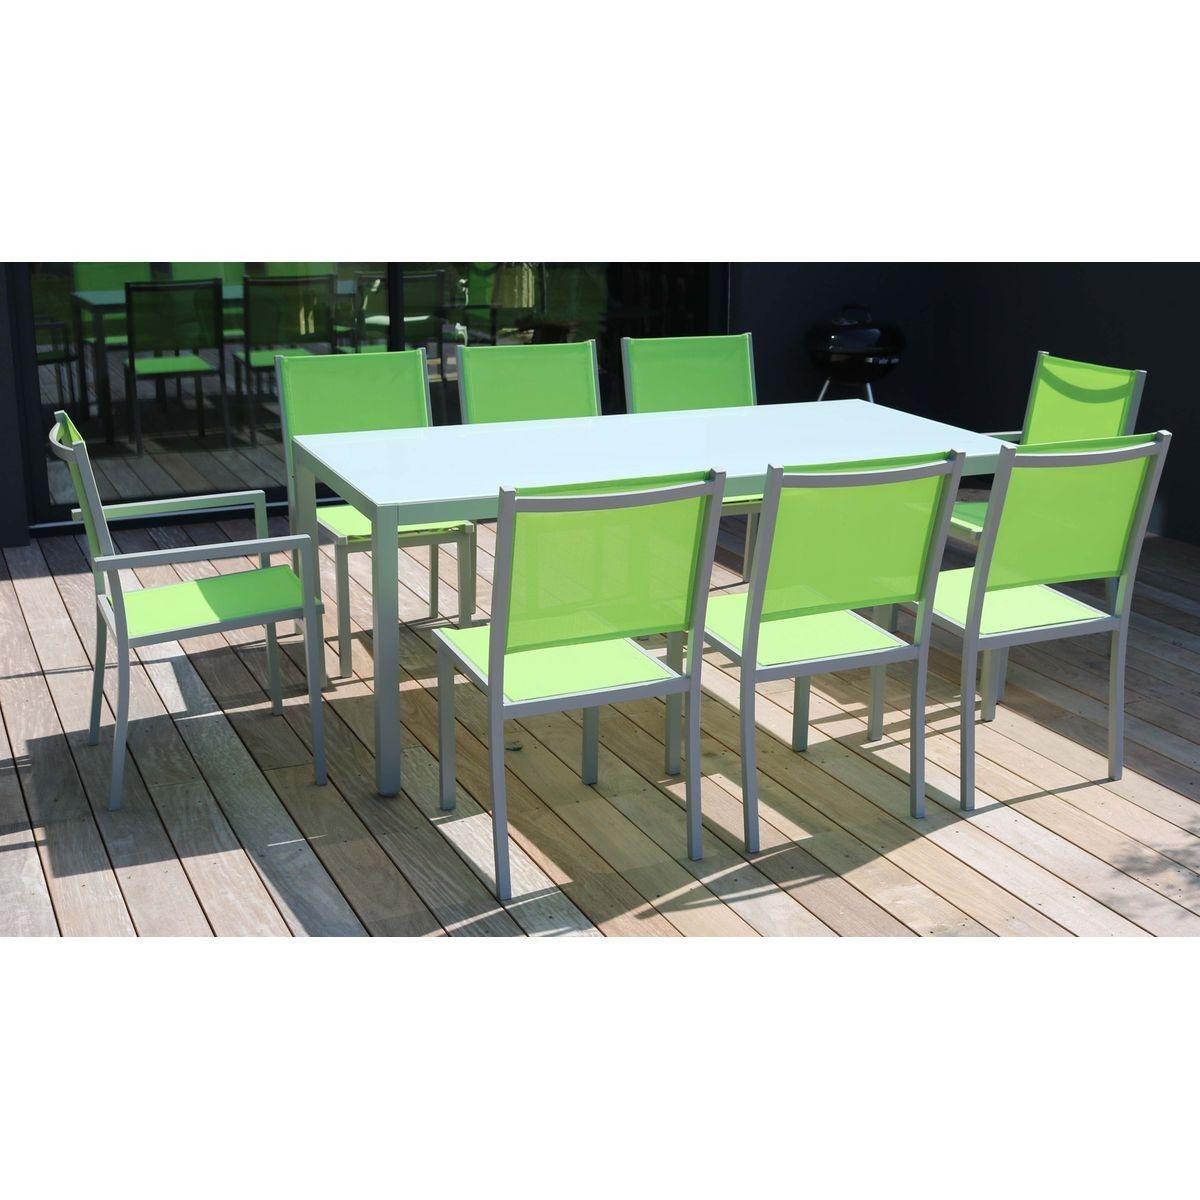 Table De Jardin En Aluminium Et Verre 8 Places, Ajaccio ...